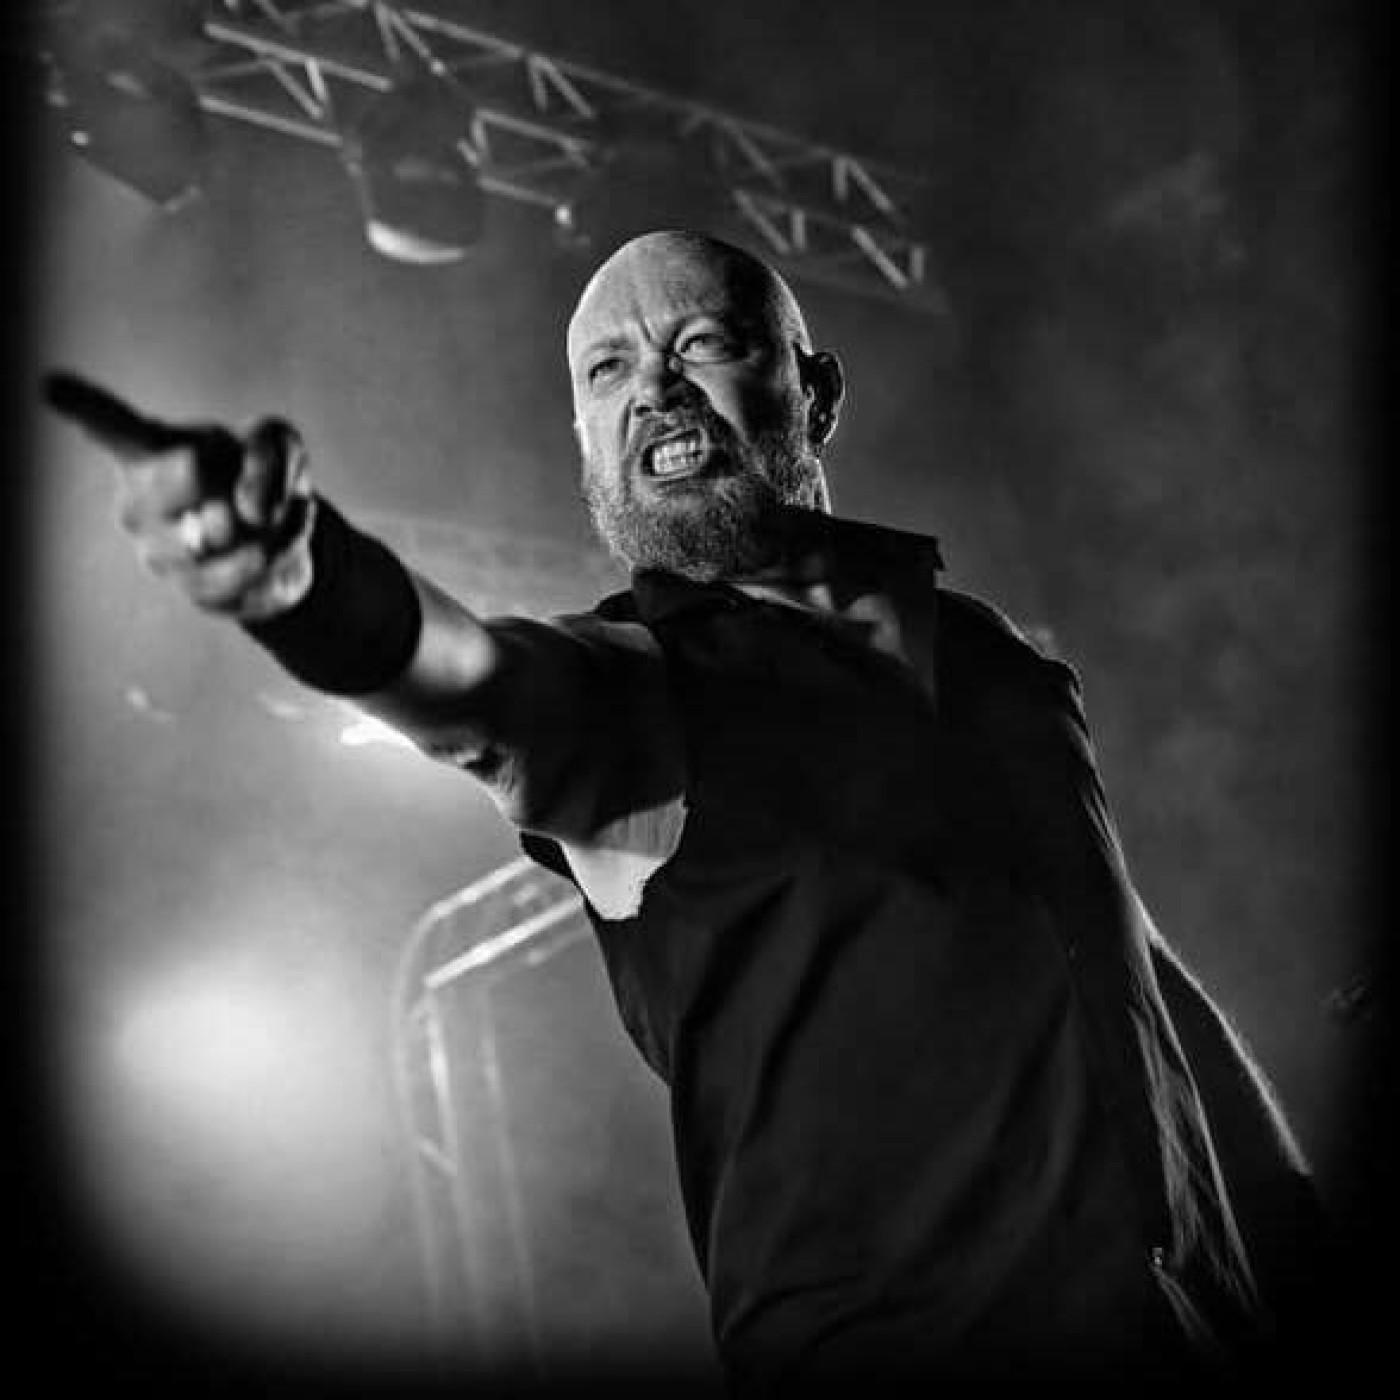 213Rock Podcast Harrag Melodica Interview with Stef Buriez Loudblast 25 02 20